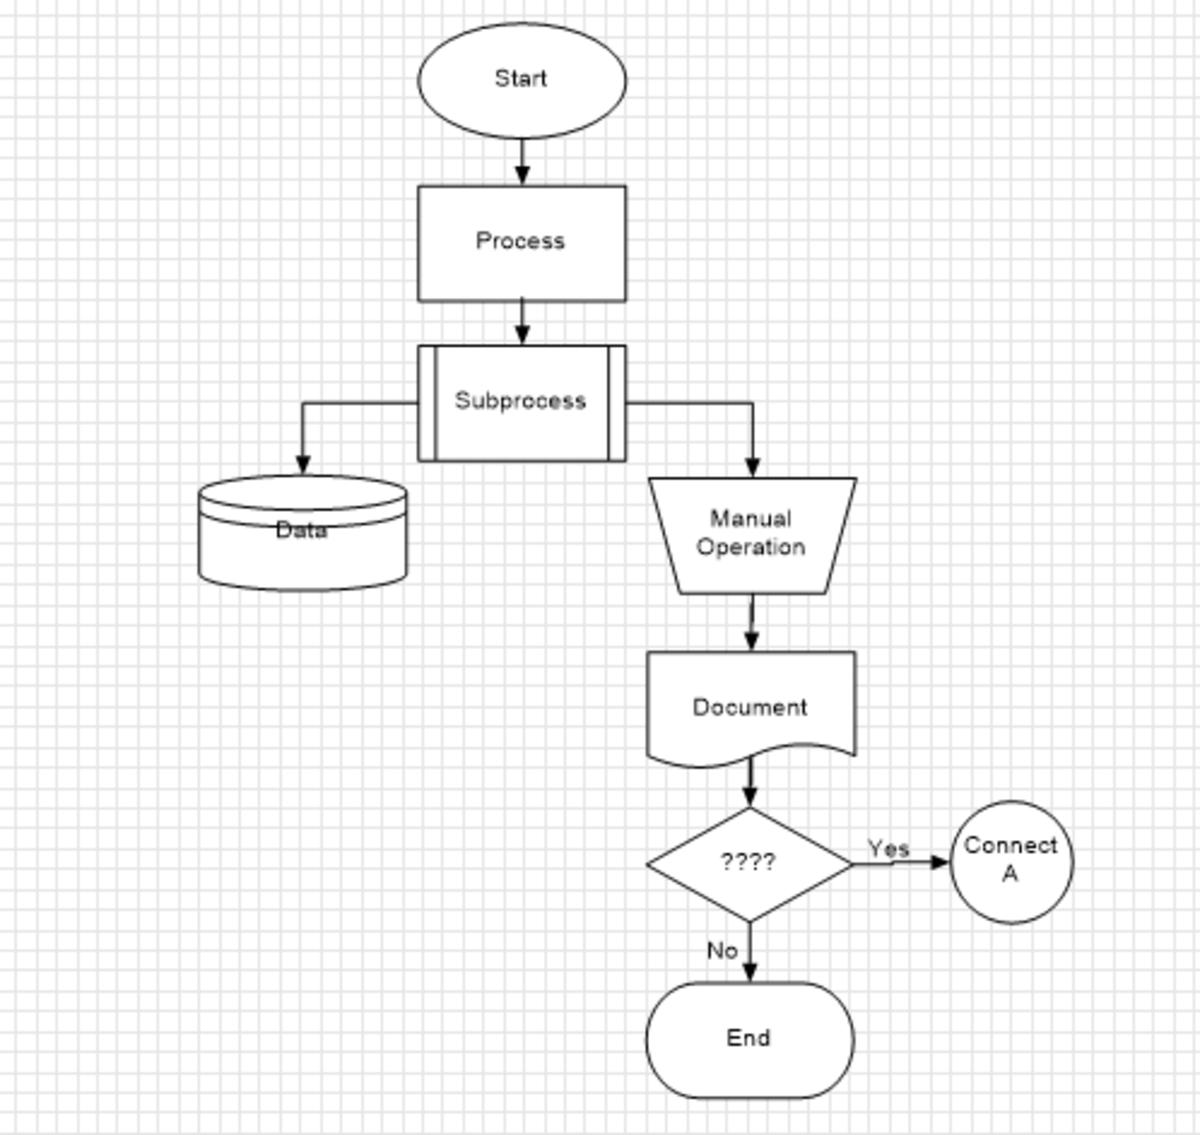 iso process flow diagram symbols auto electrical wiring diagram 2004 kenworth t800 wiring schematic 61 chevy truck wiring diagram 1979 ez go wiring harness diagram 2011 ram 1500 lights wiring diagram